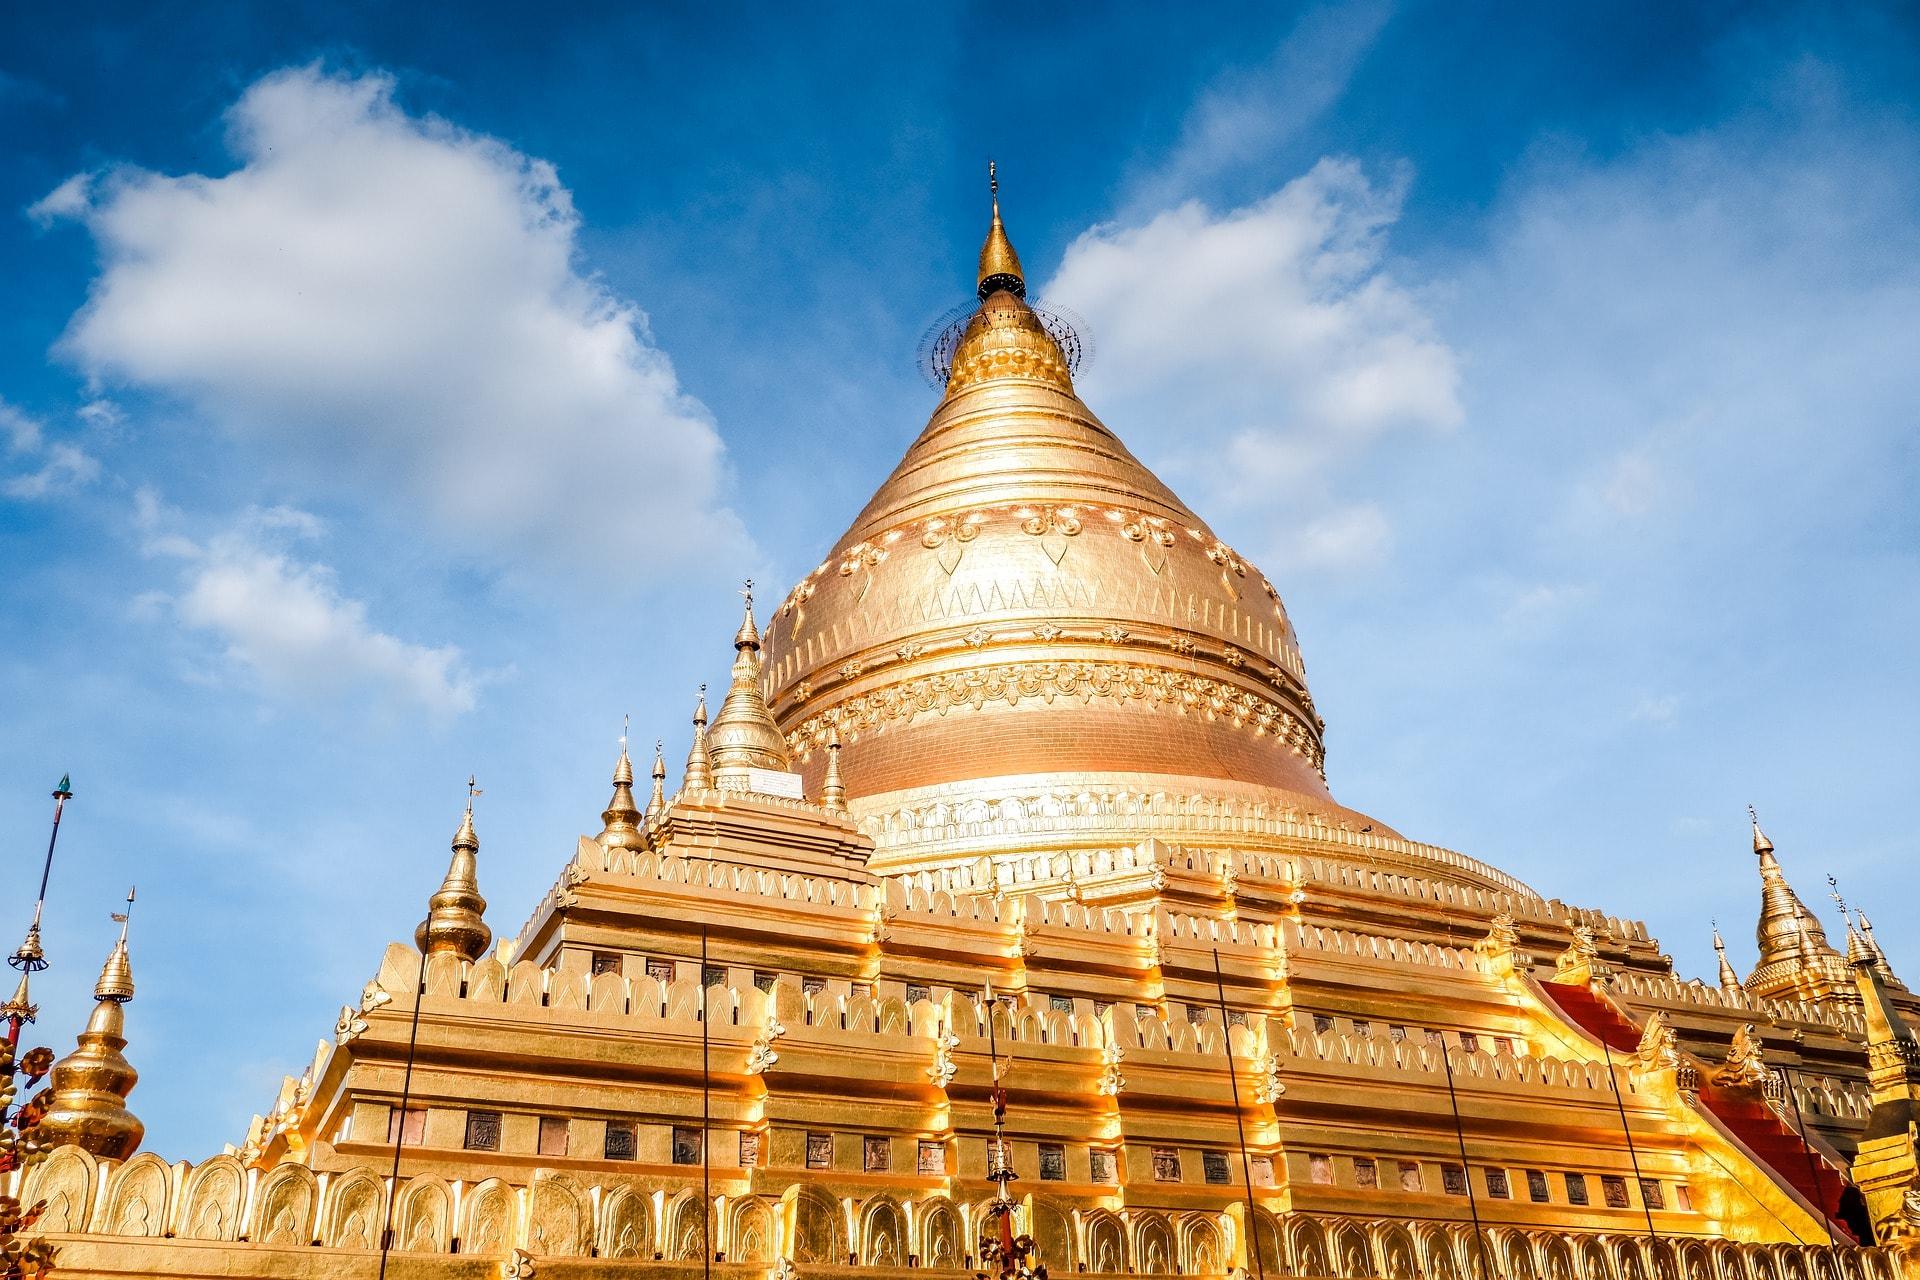 Visit the Shwezigon Pagoda